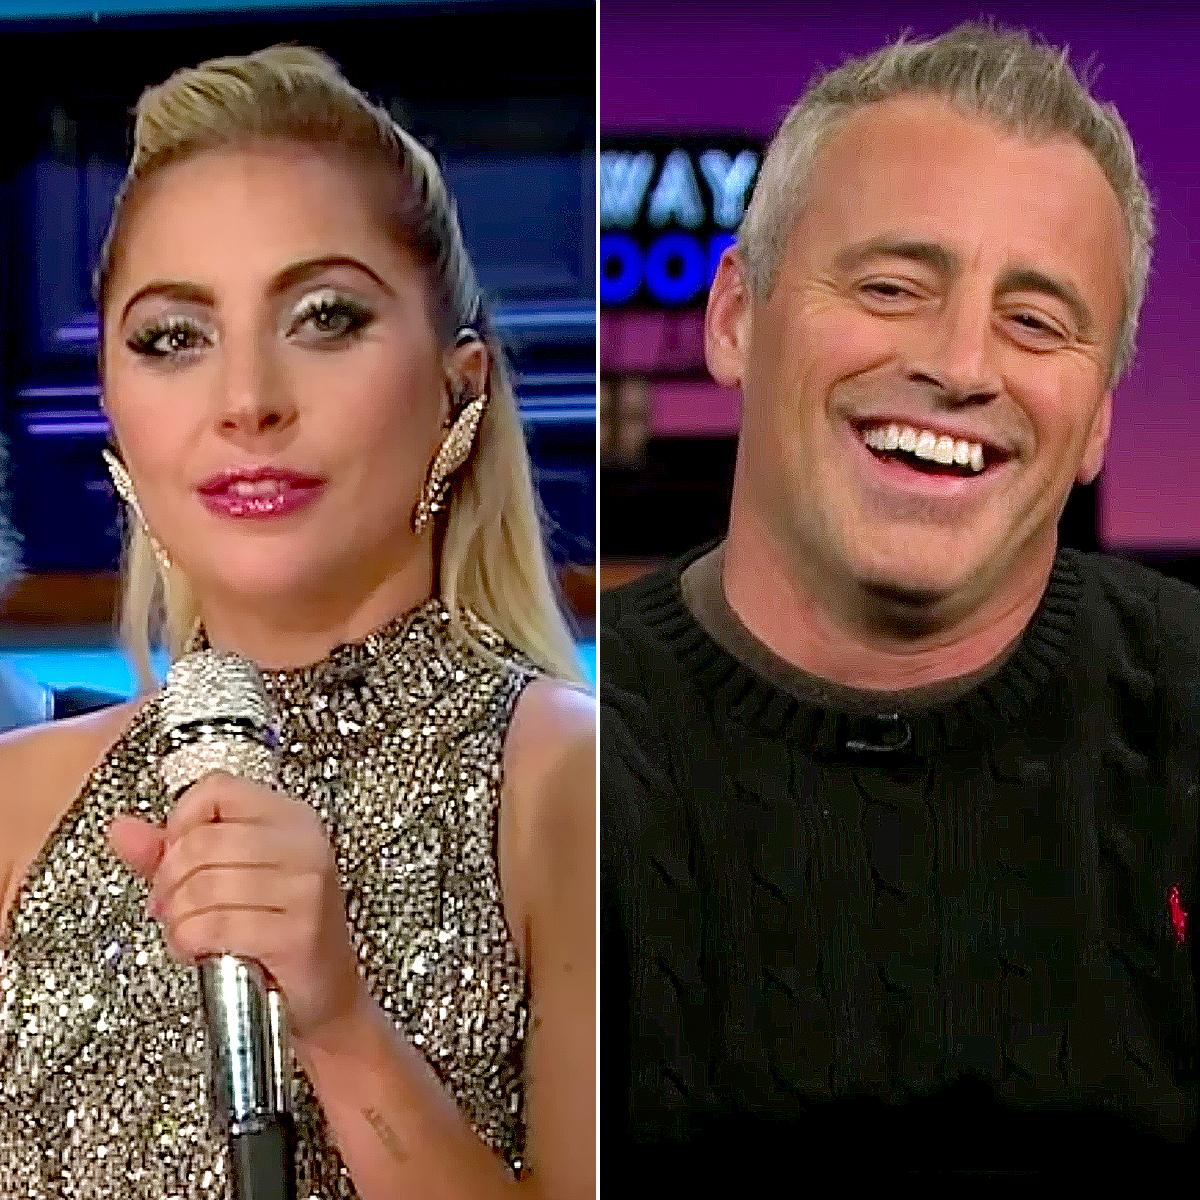 Lady Gaga and Matt LeBlanc